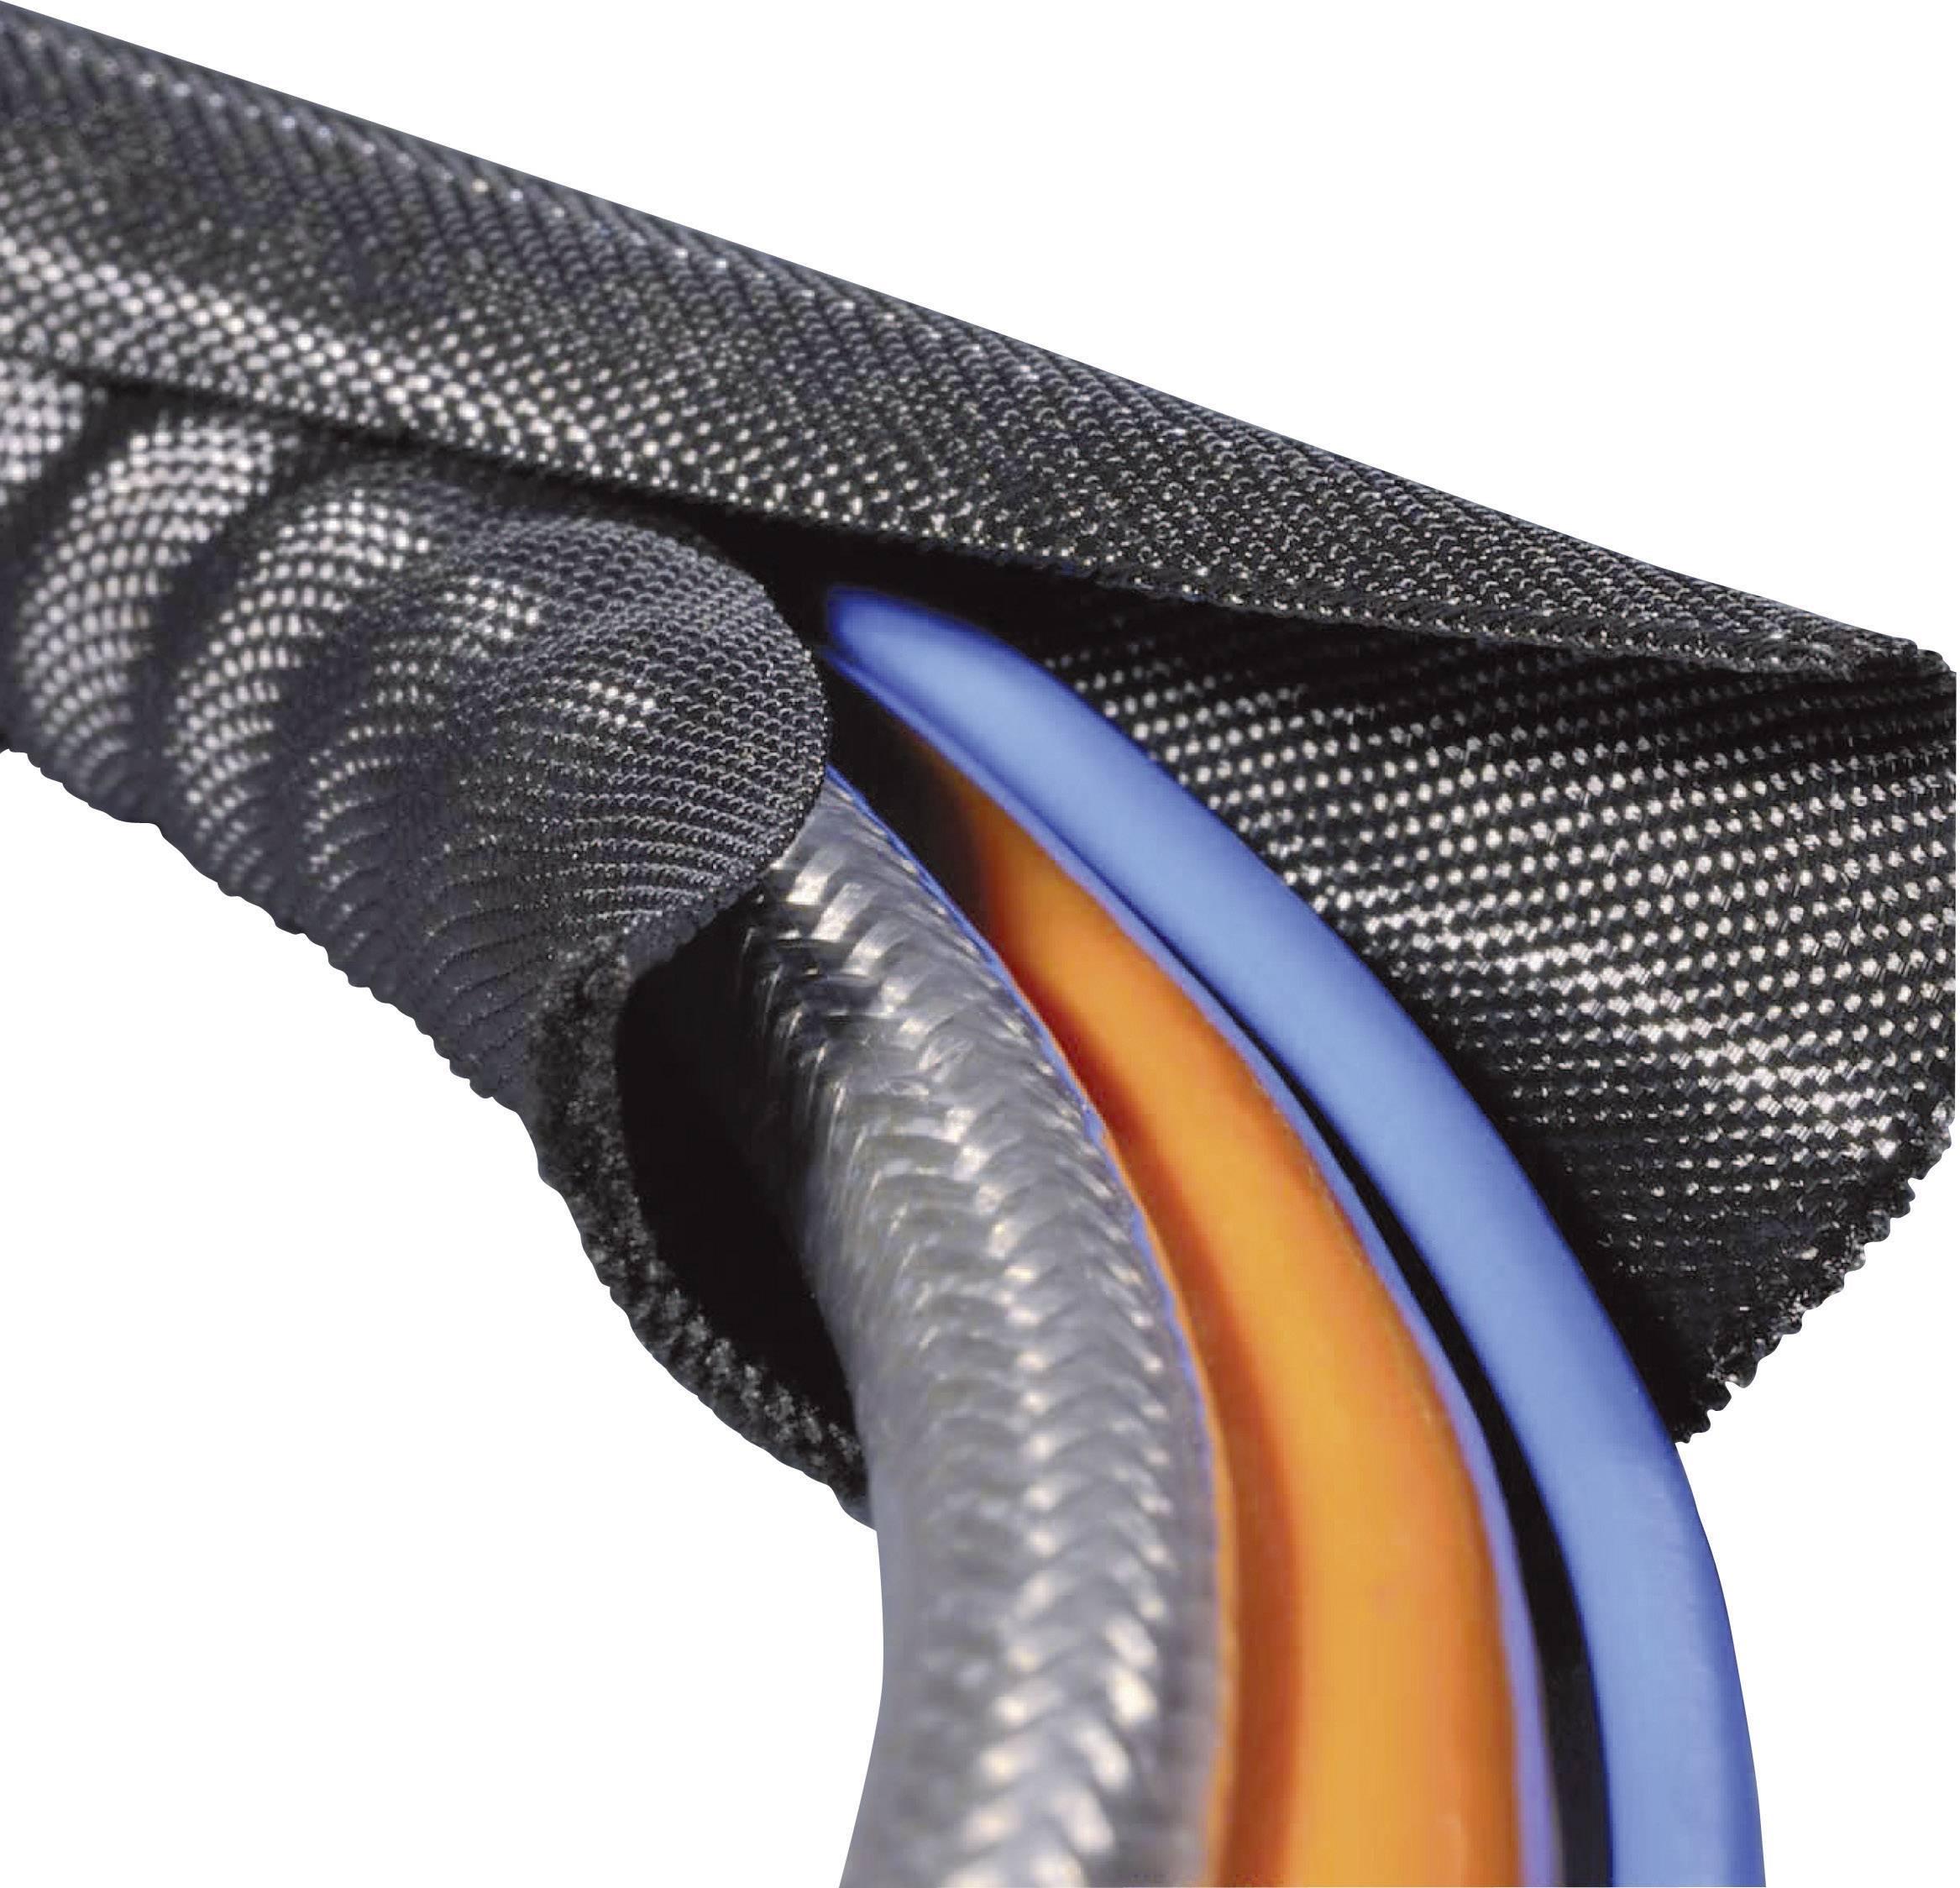 Ochranný oplet HellermannTyton Twist-In 29, 25 do 29 mm, -70 do +125 °C, metrový tovar, čierna